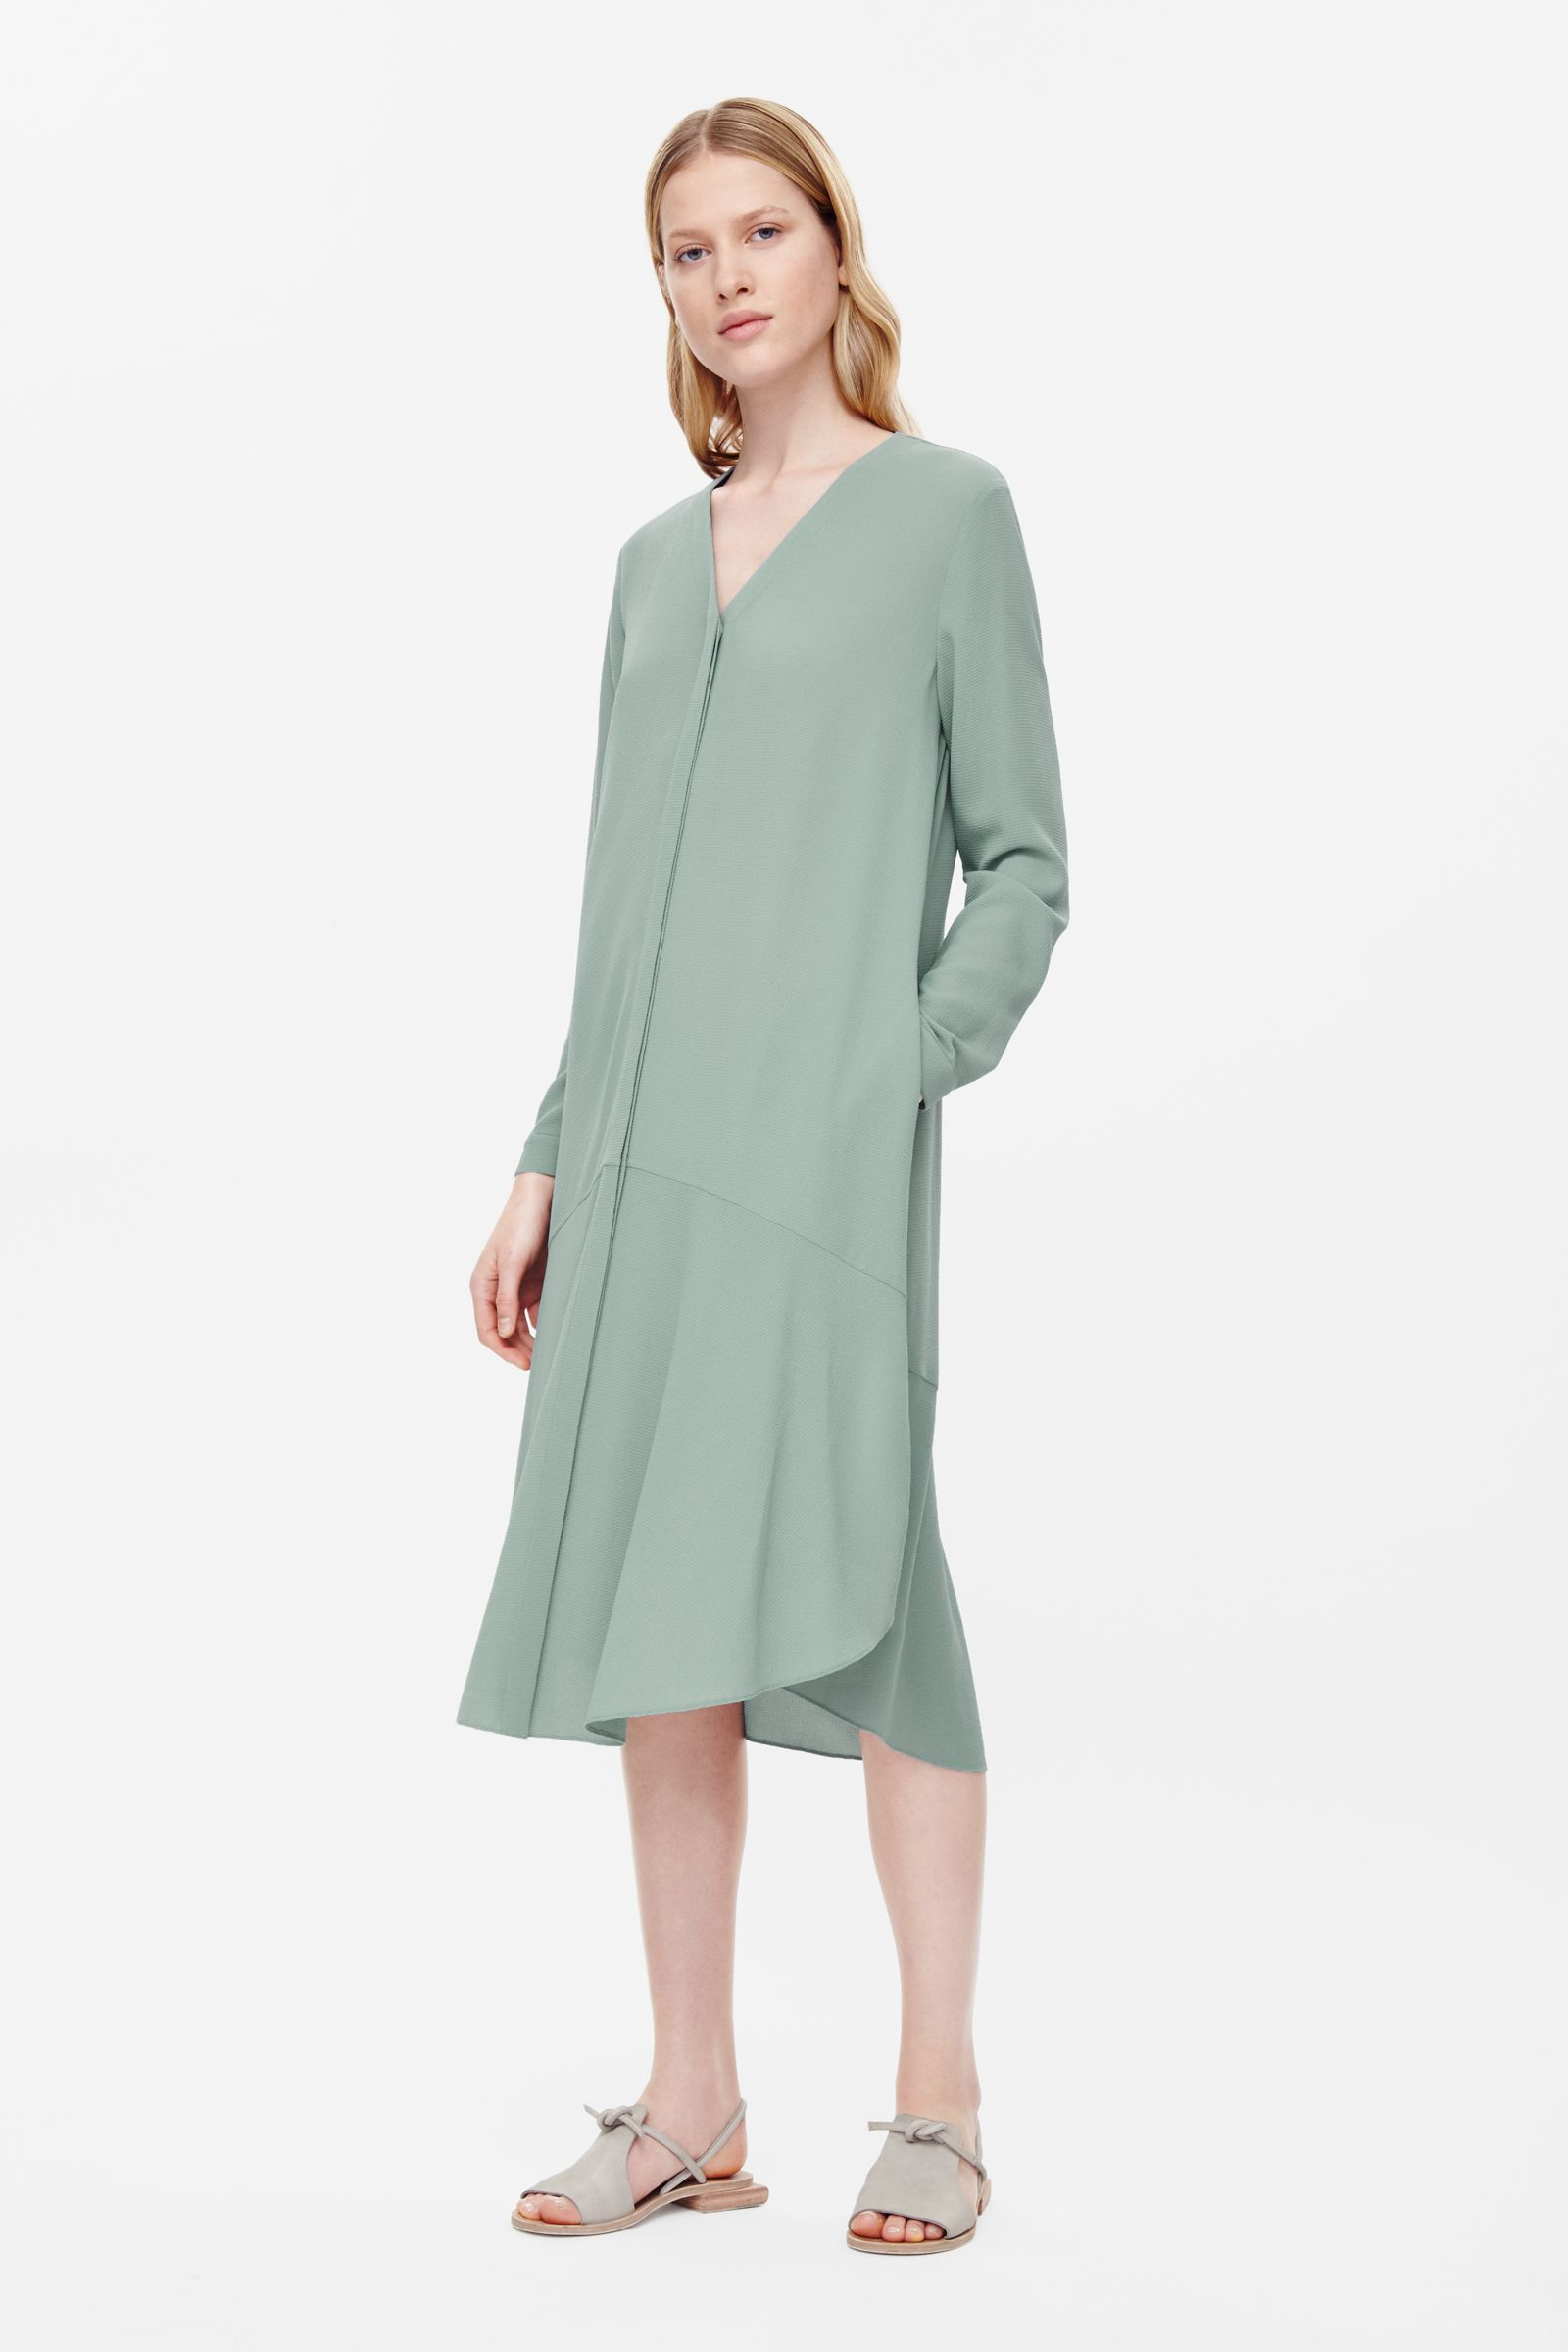 object style COS anti fit dress .jpg